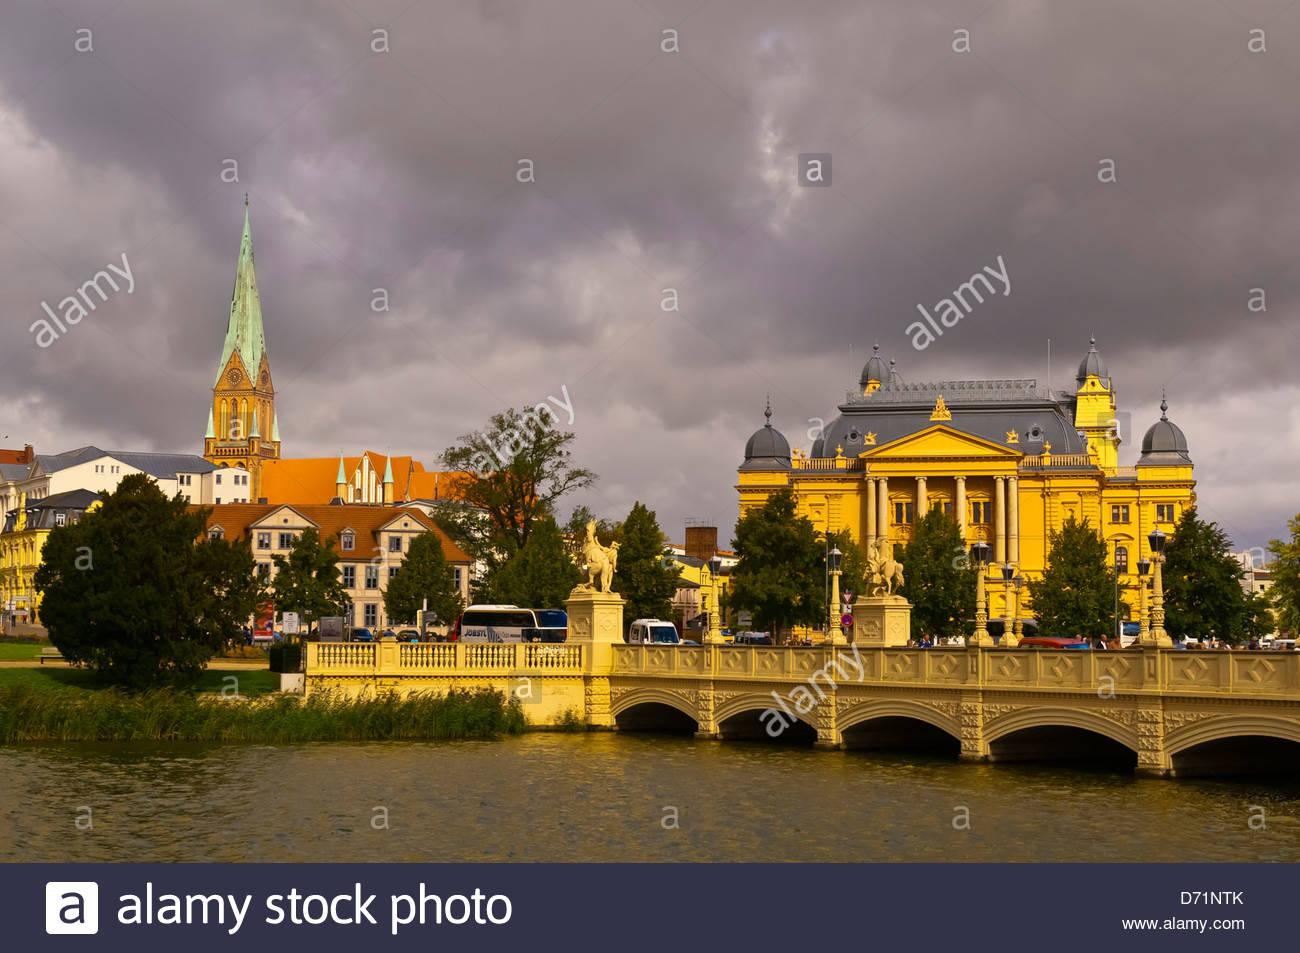 Schwerin, Mecklenburg-West Pomerania, Germany - Stock Image